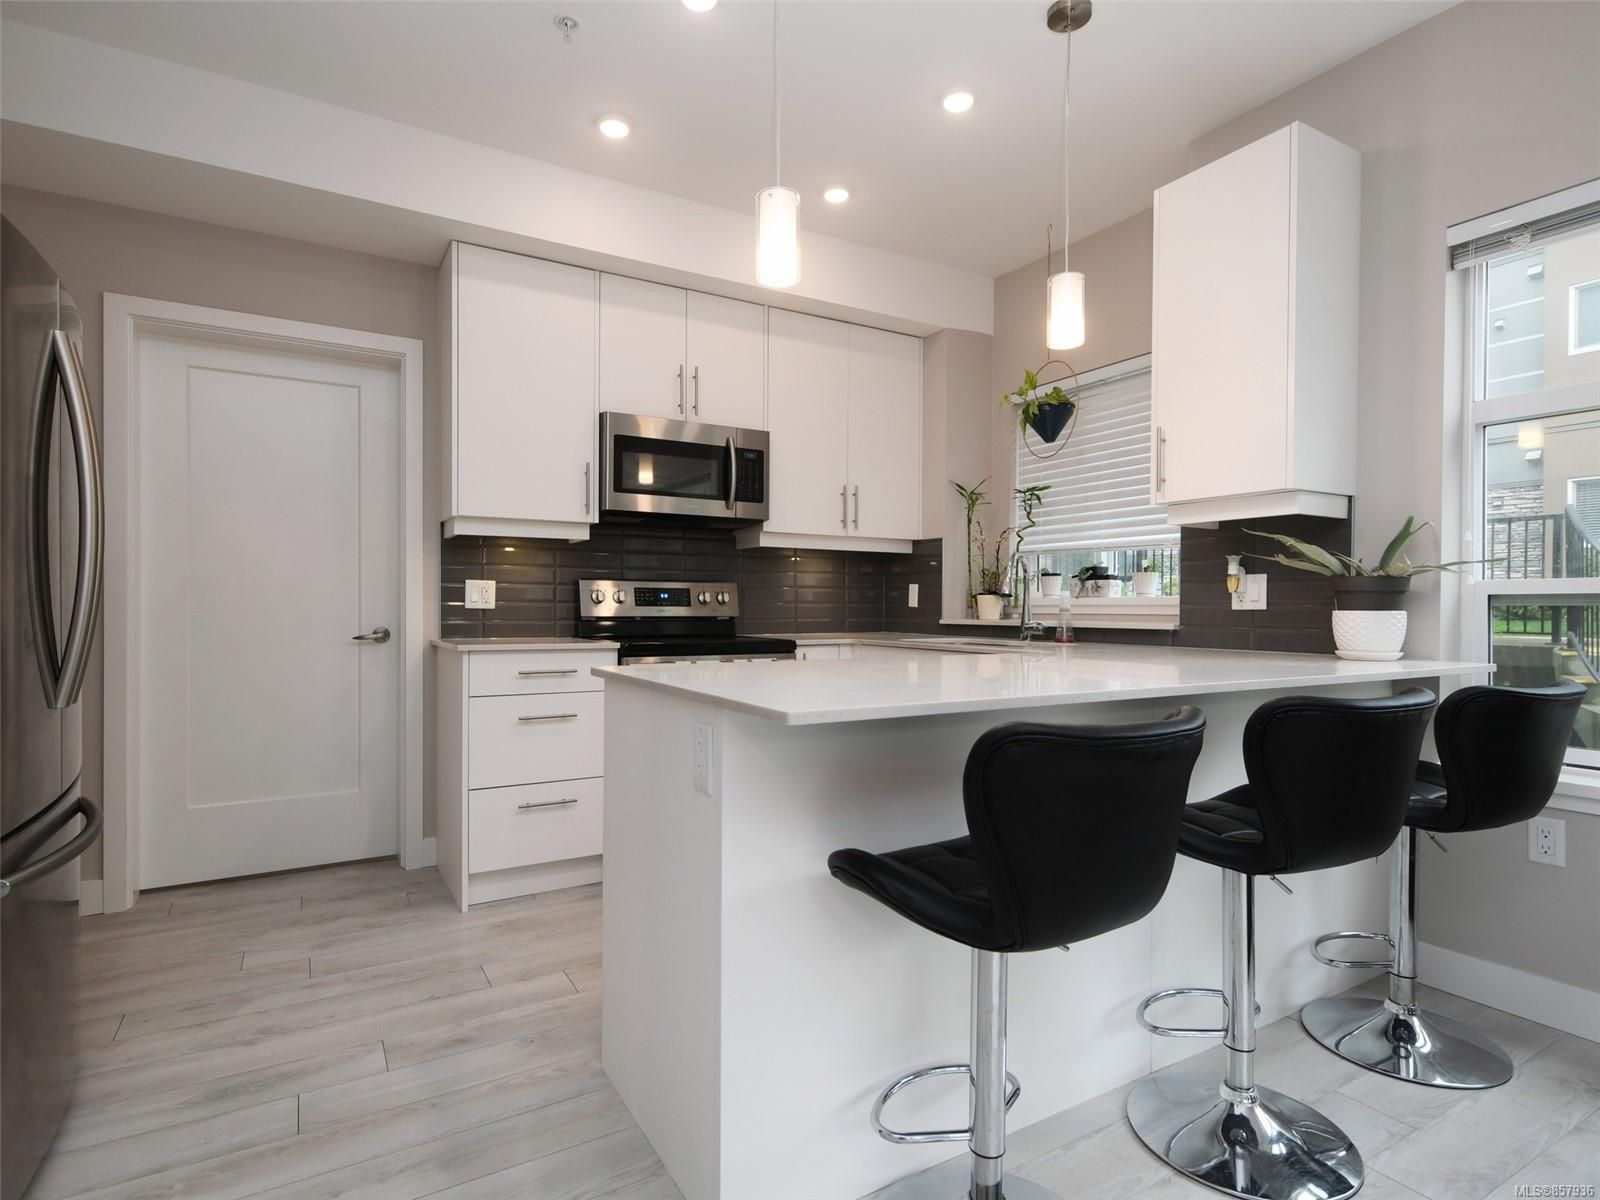 Photo 6: Photos: 103 1020 Inverness Rd in Saanich: SE Quadra Condo for sale (Saanich East)  : MLS®# 857936